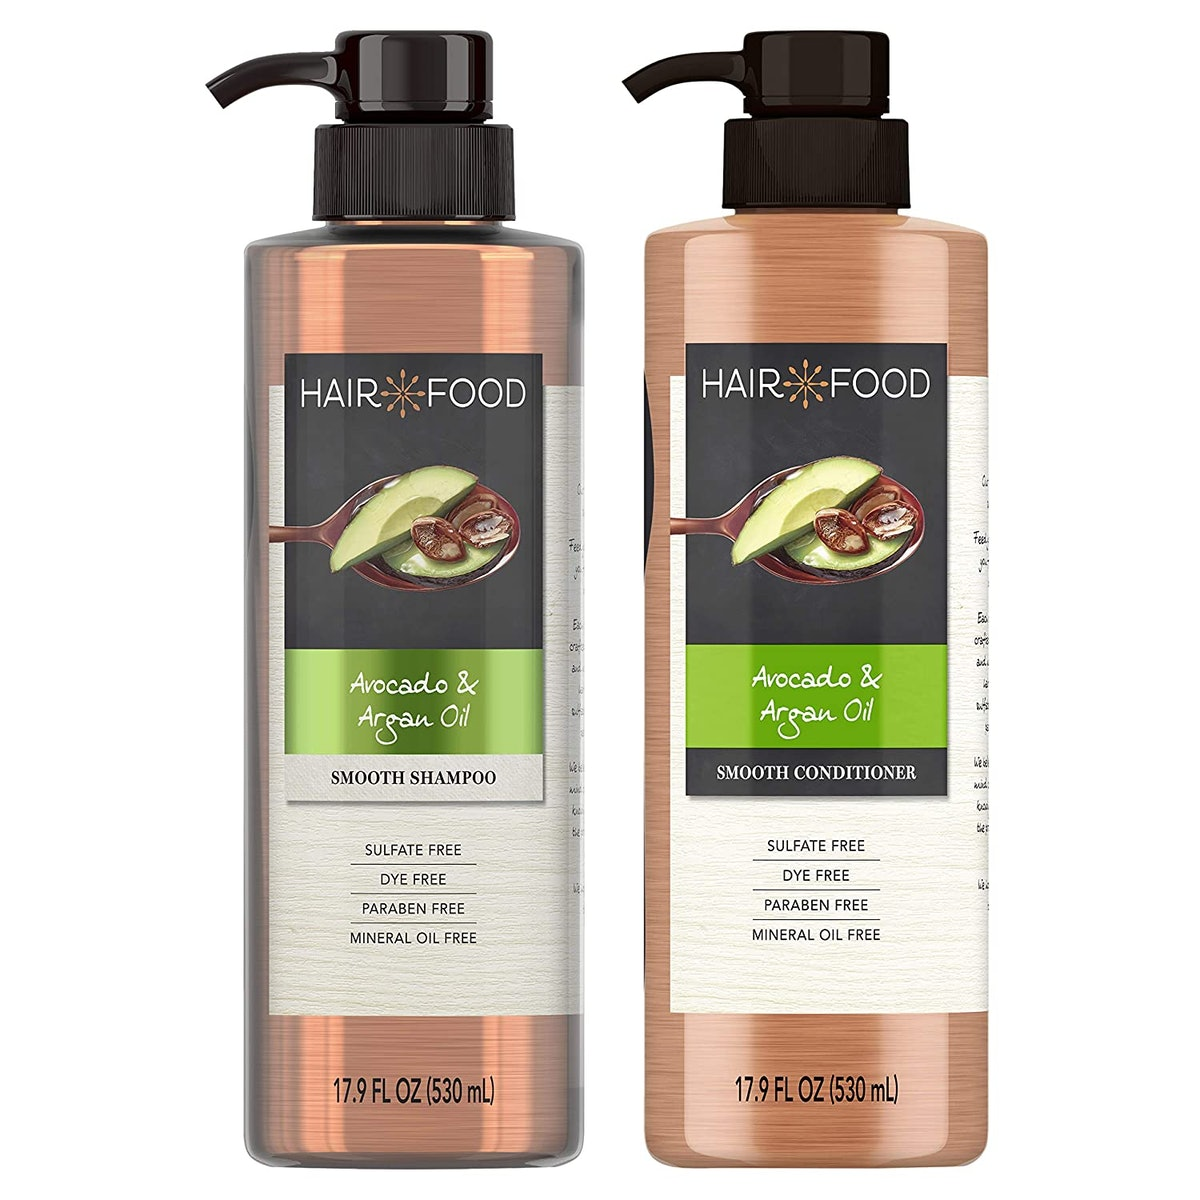 Hair Food Shampoo & Conditioner Set with Argan Oil & Avocado